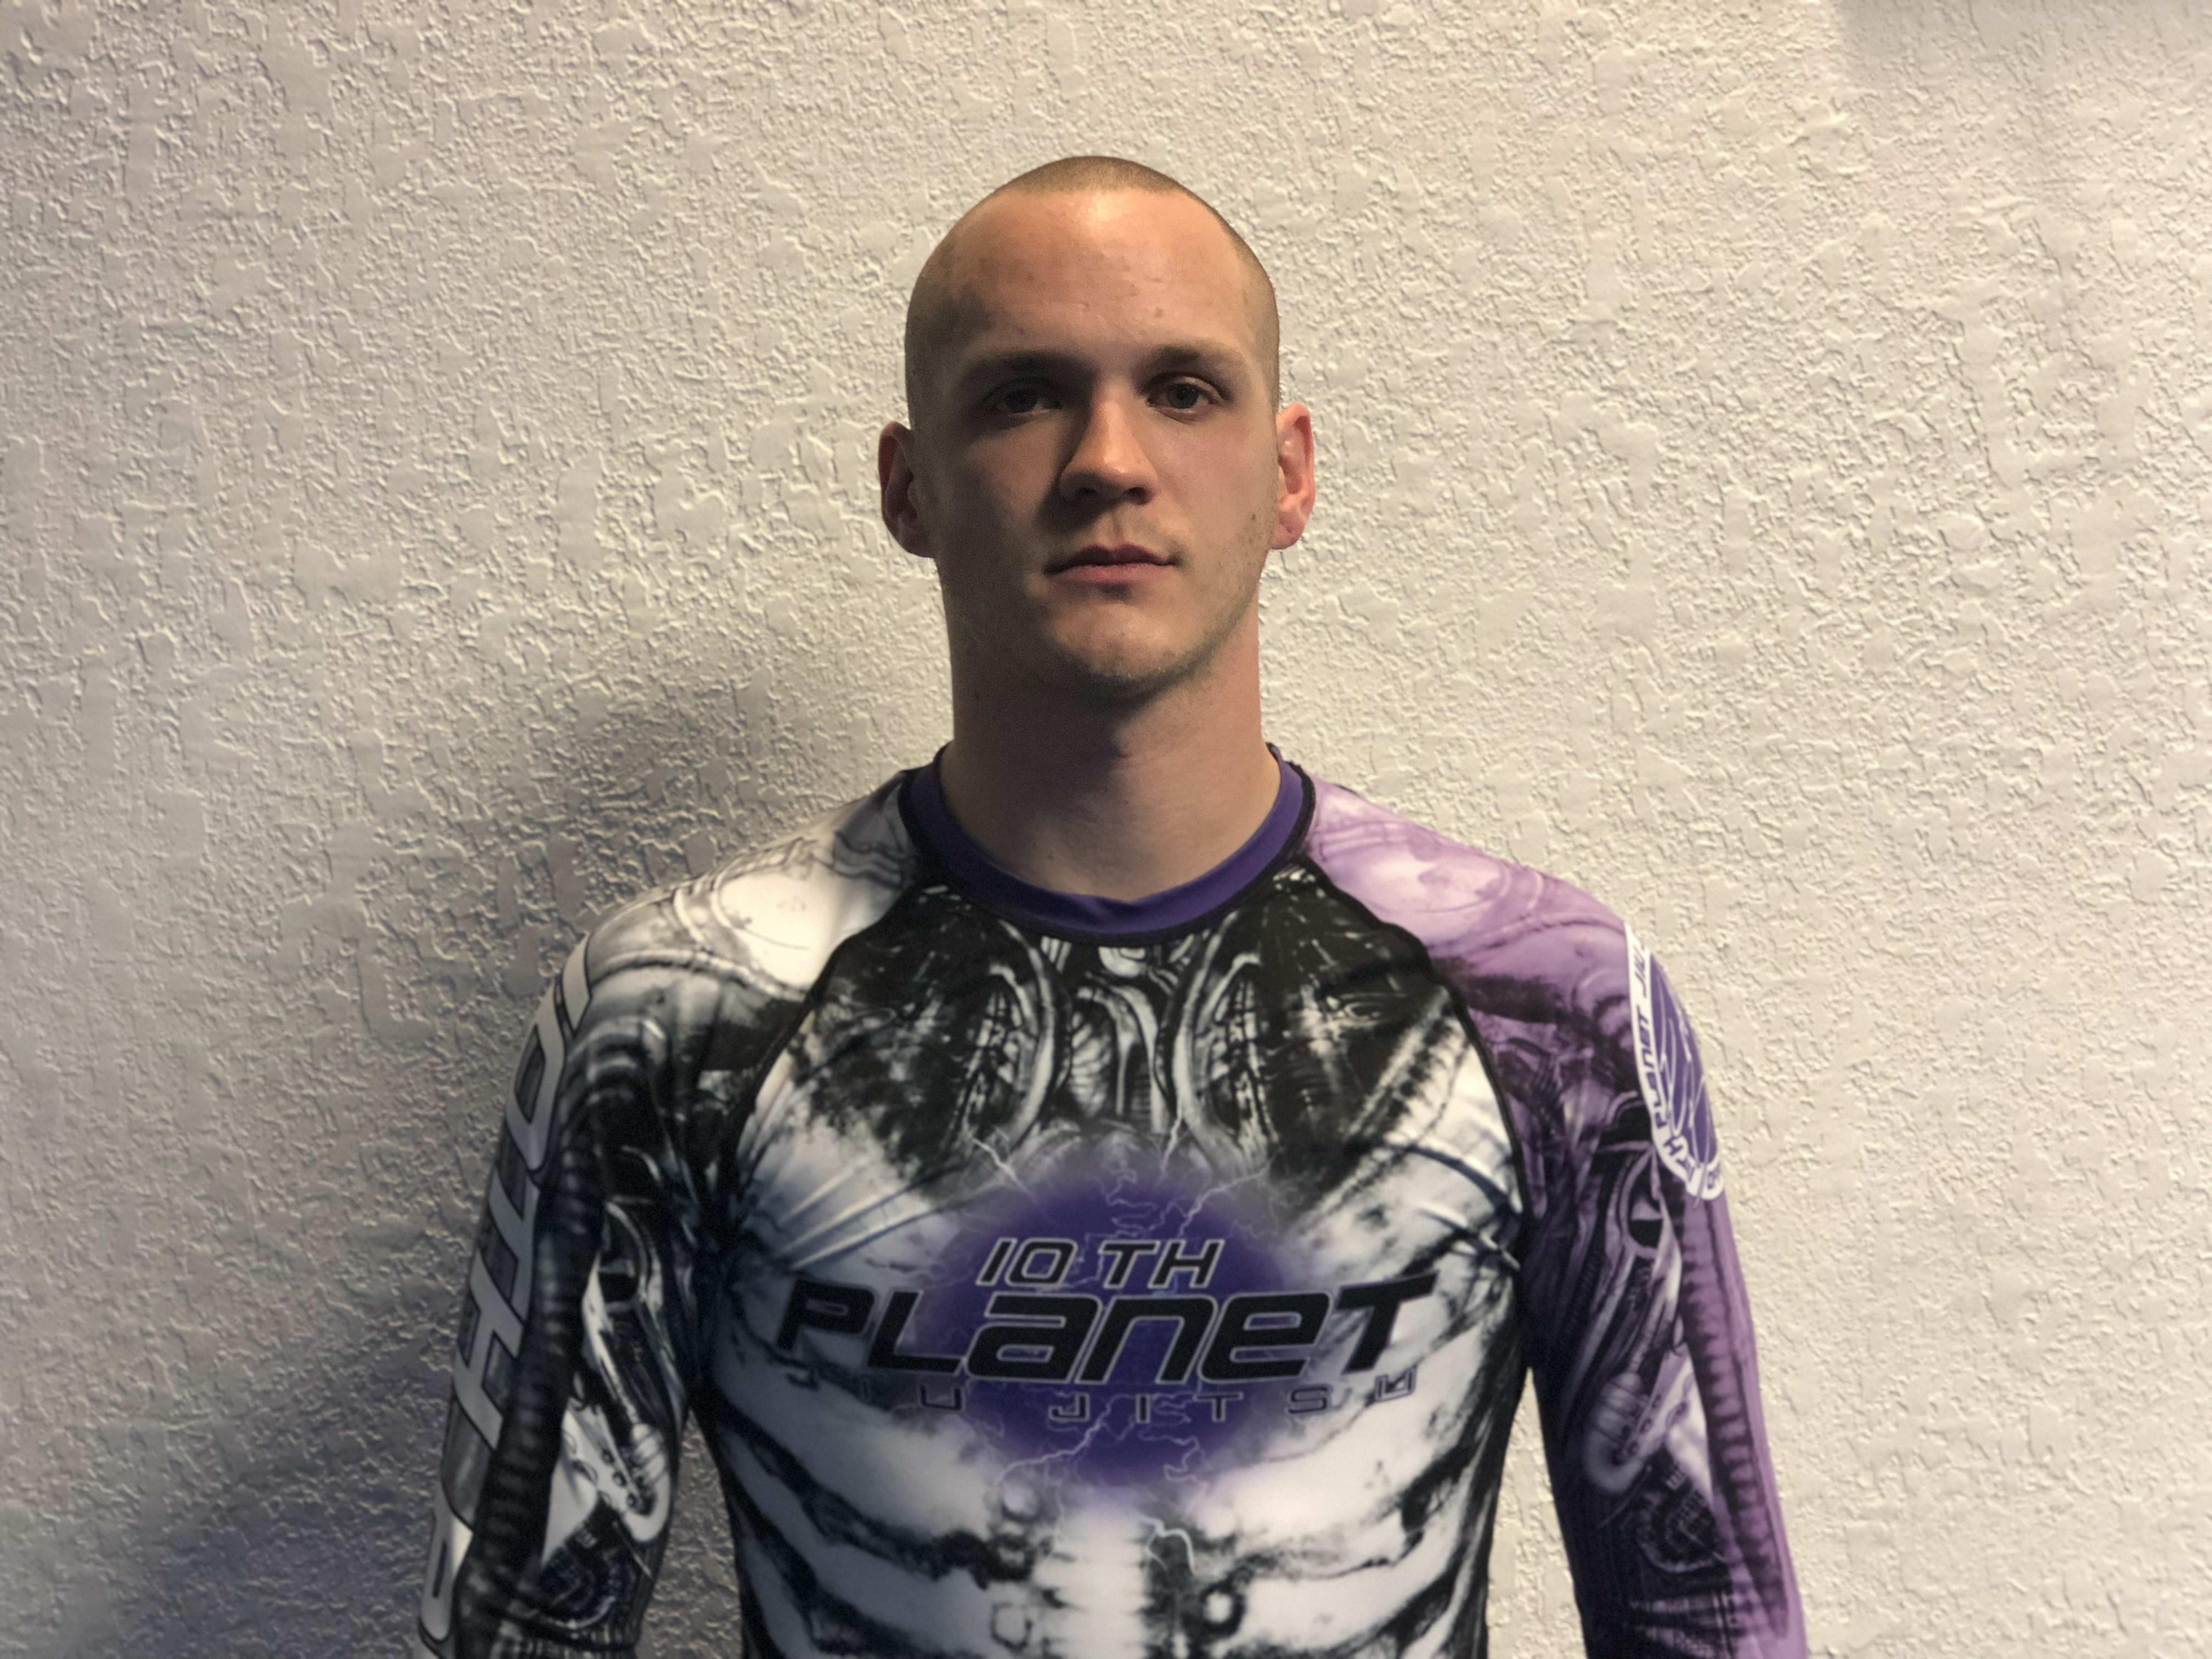 Austin Mayer in Newark - 10th Planet Jiu Jitsu Newark